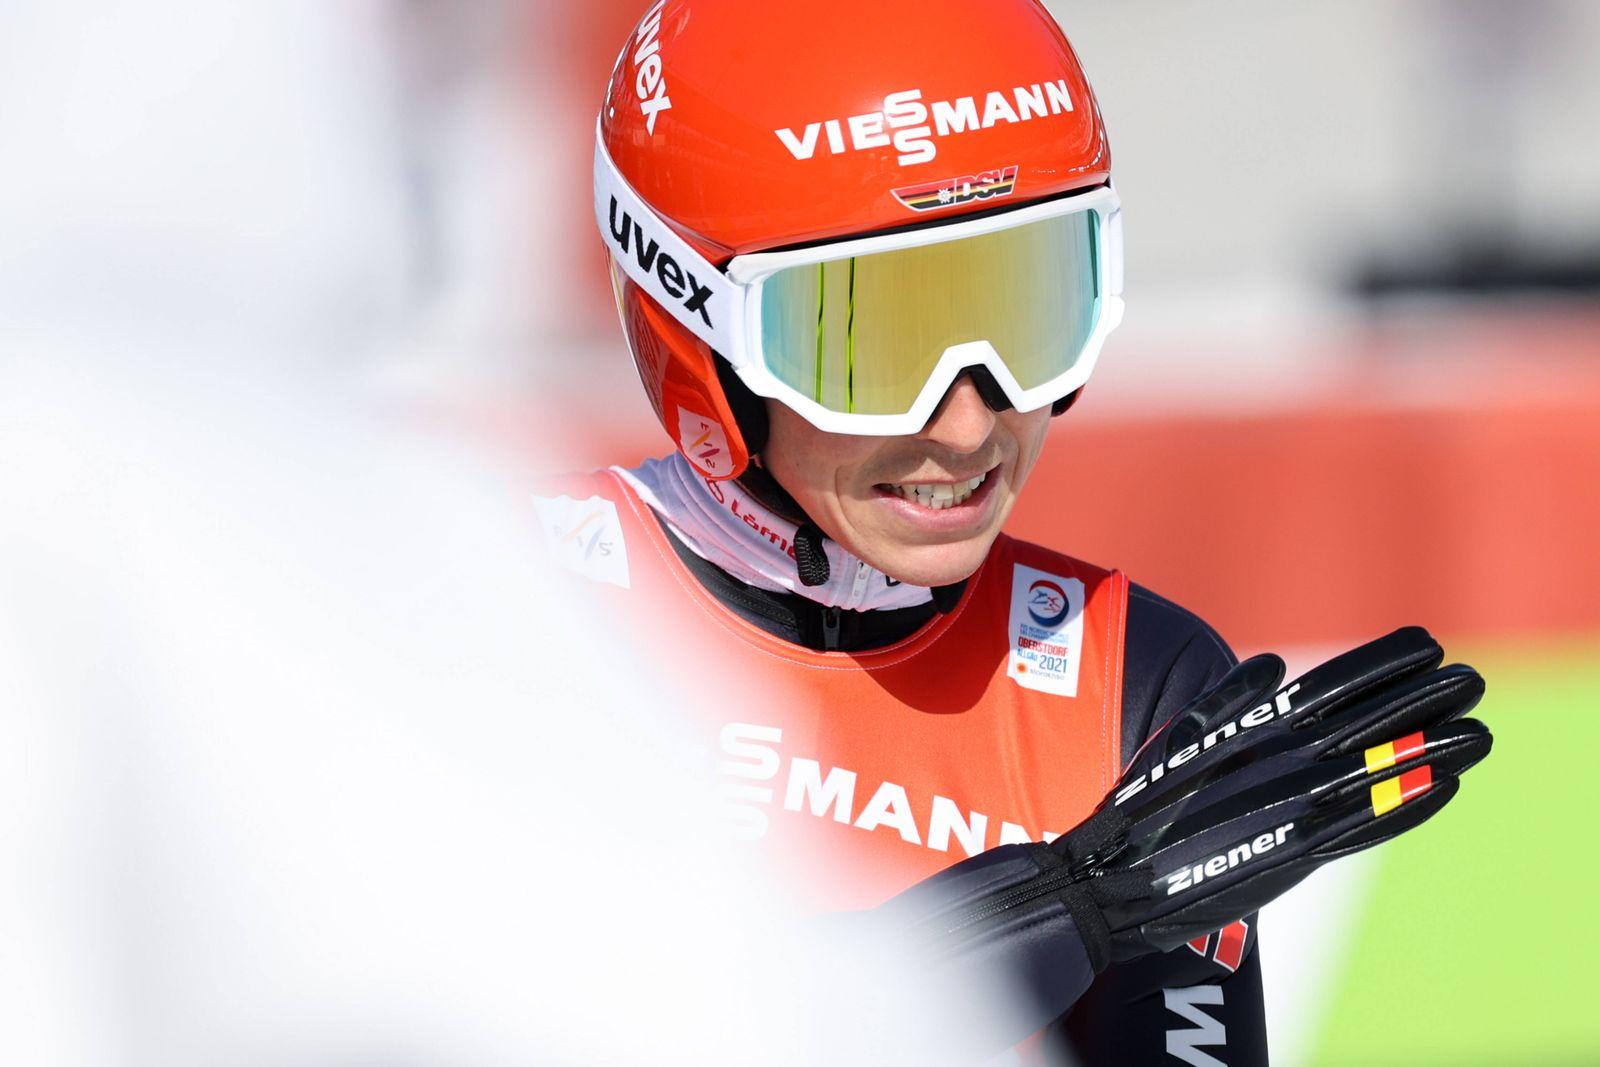 NORDIC SKIING - FIS Nordic World Ski Championships Oberstdorf 2021 OBERSTDORF,GERMANY,26.FEB.21 - NORDIC SKIING, NORDIC